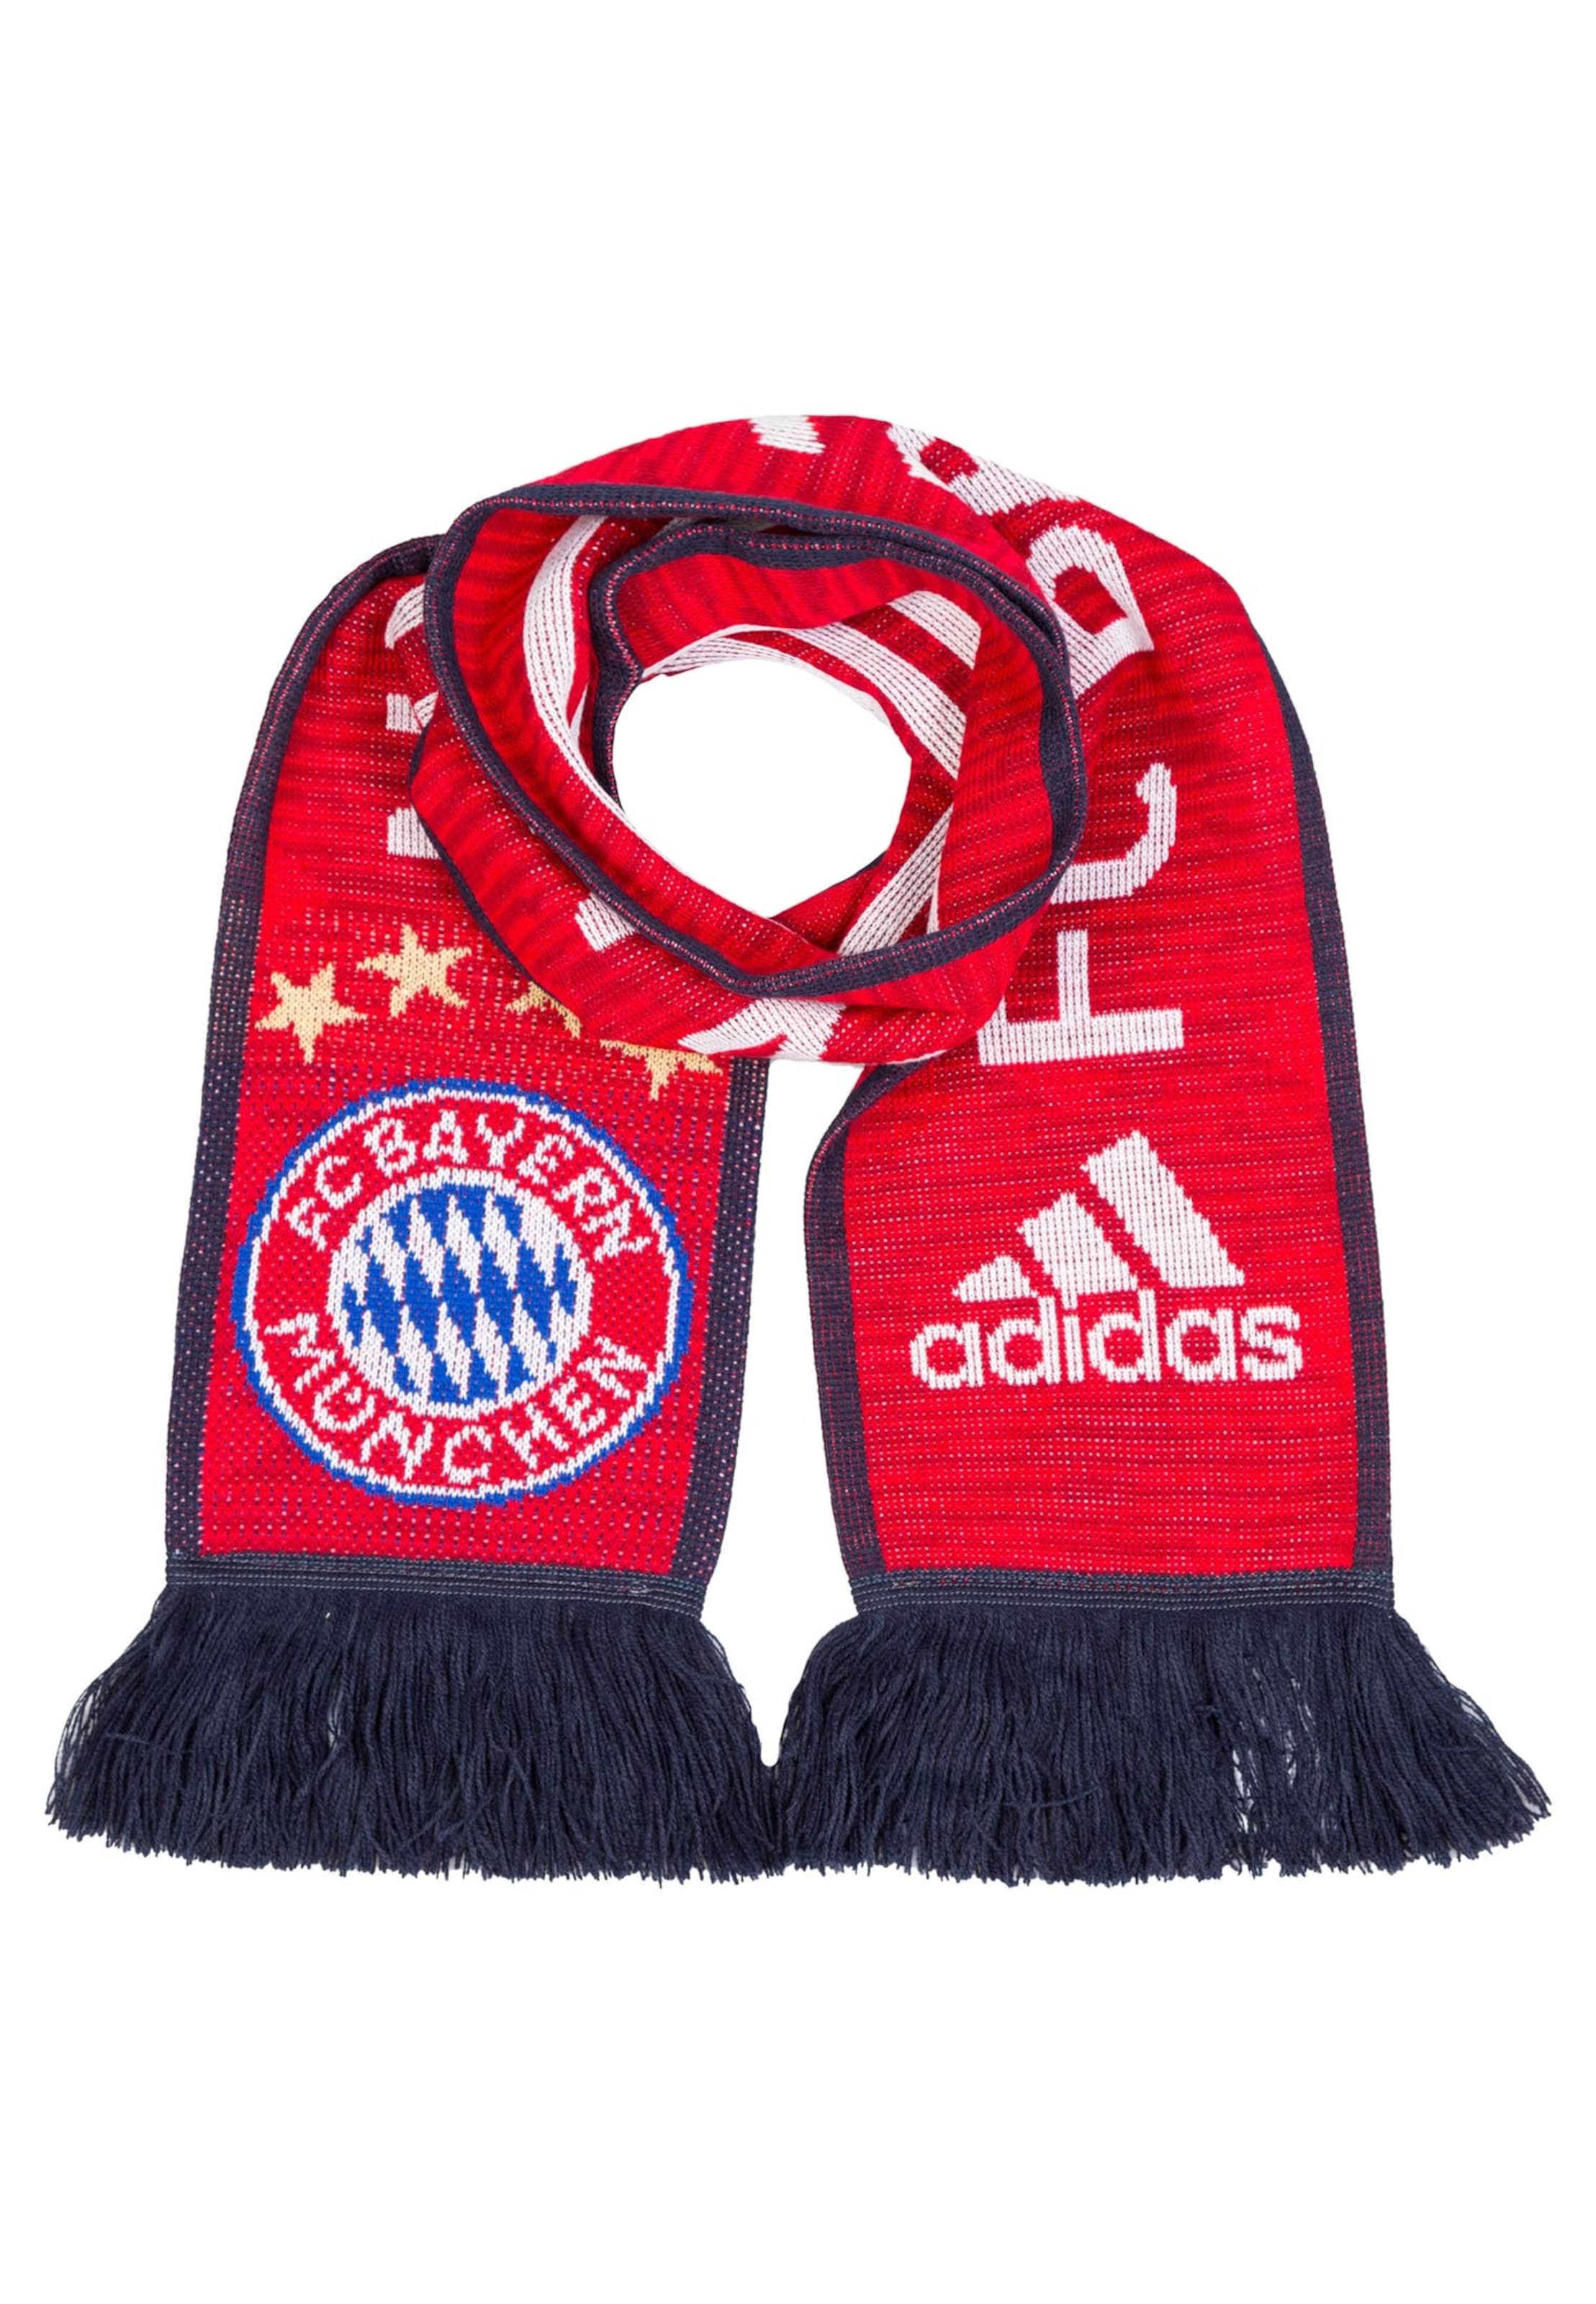 In DunkelblauRot Performance Fanschal 'fc Bayern' Adidas Weiß Yf76gby